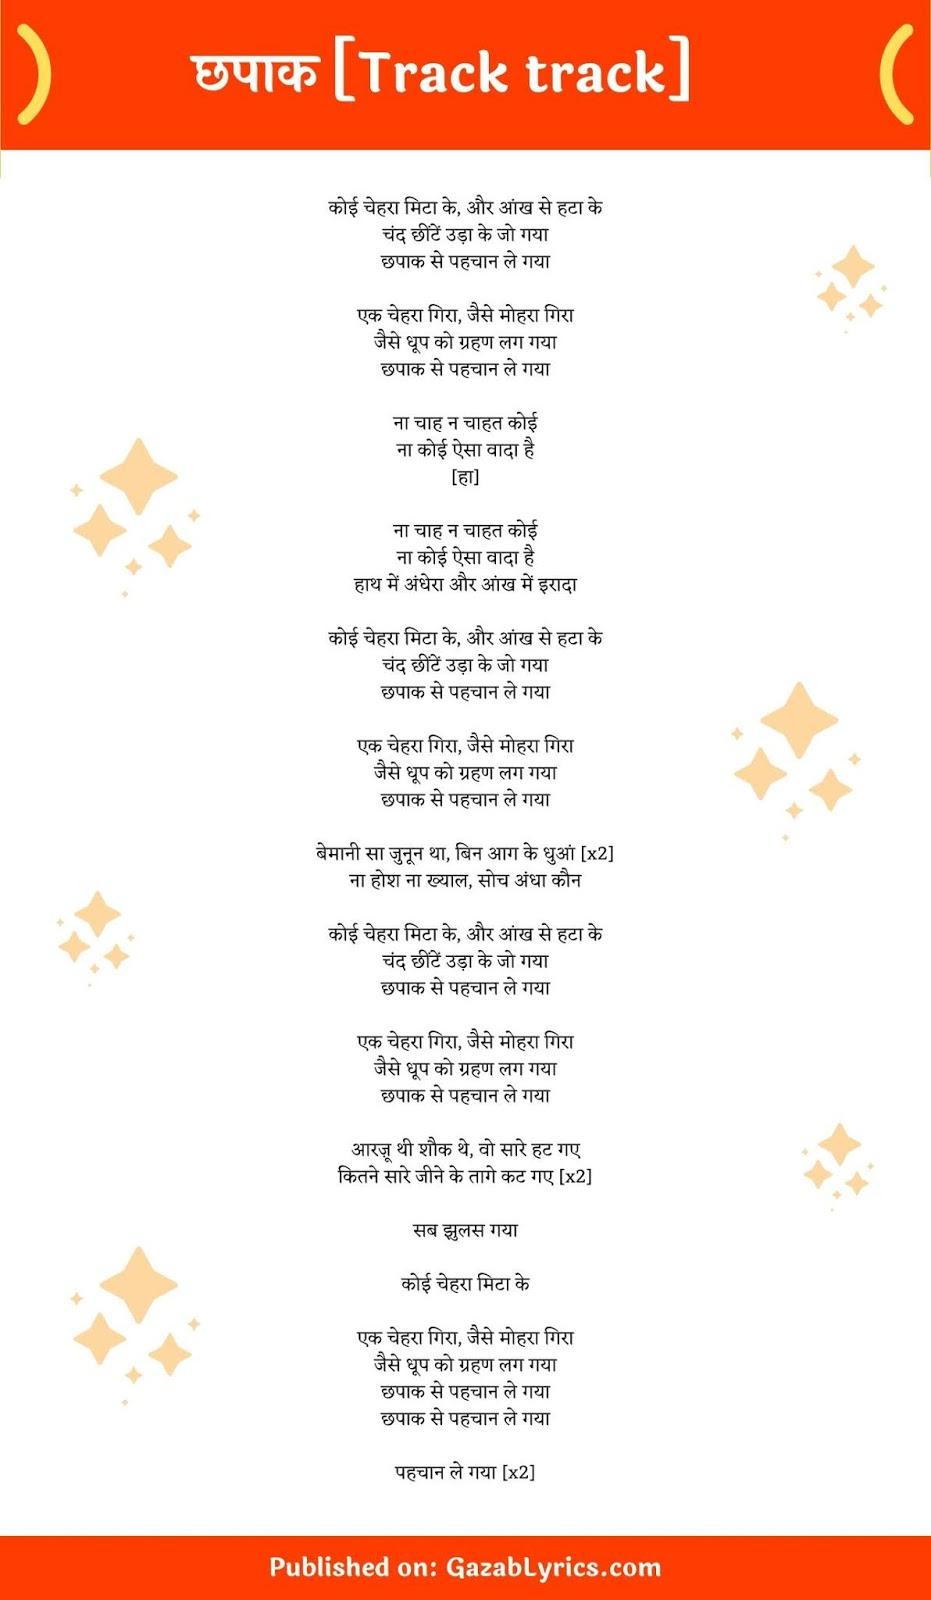 Chhapaak title track song lyrics image